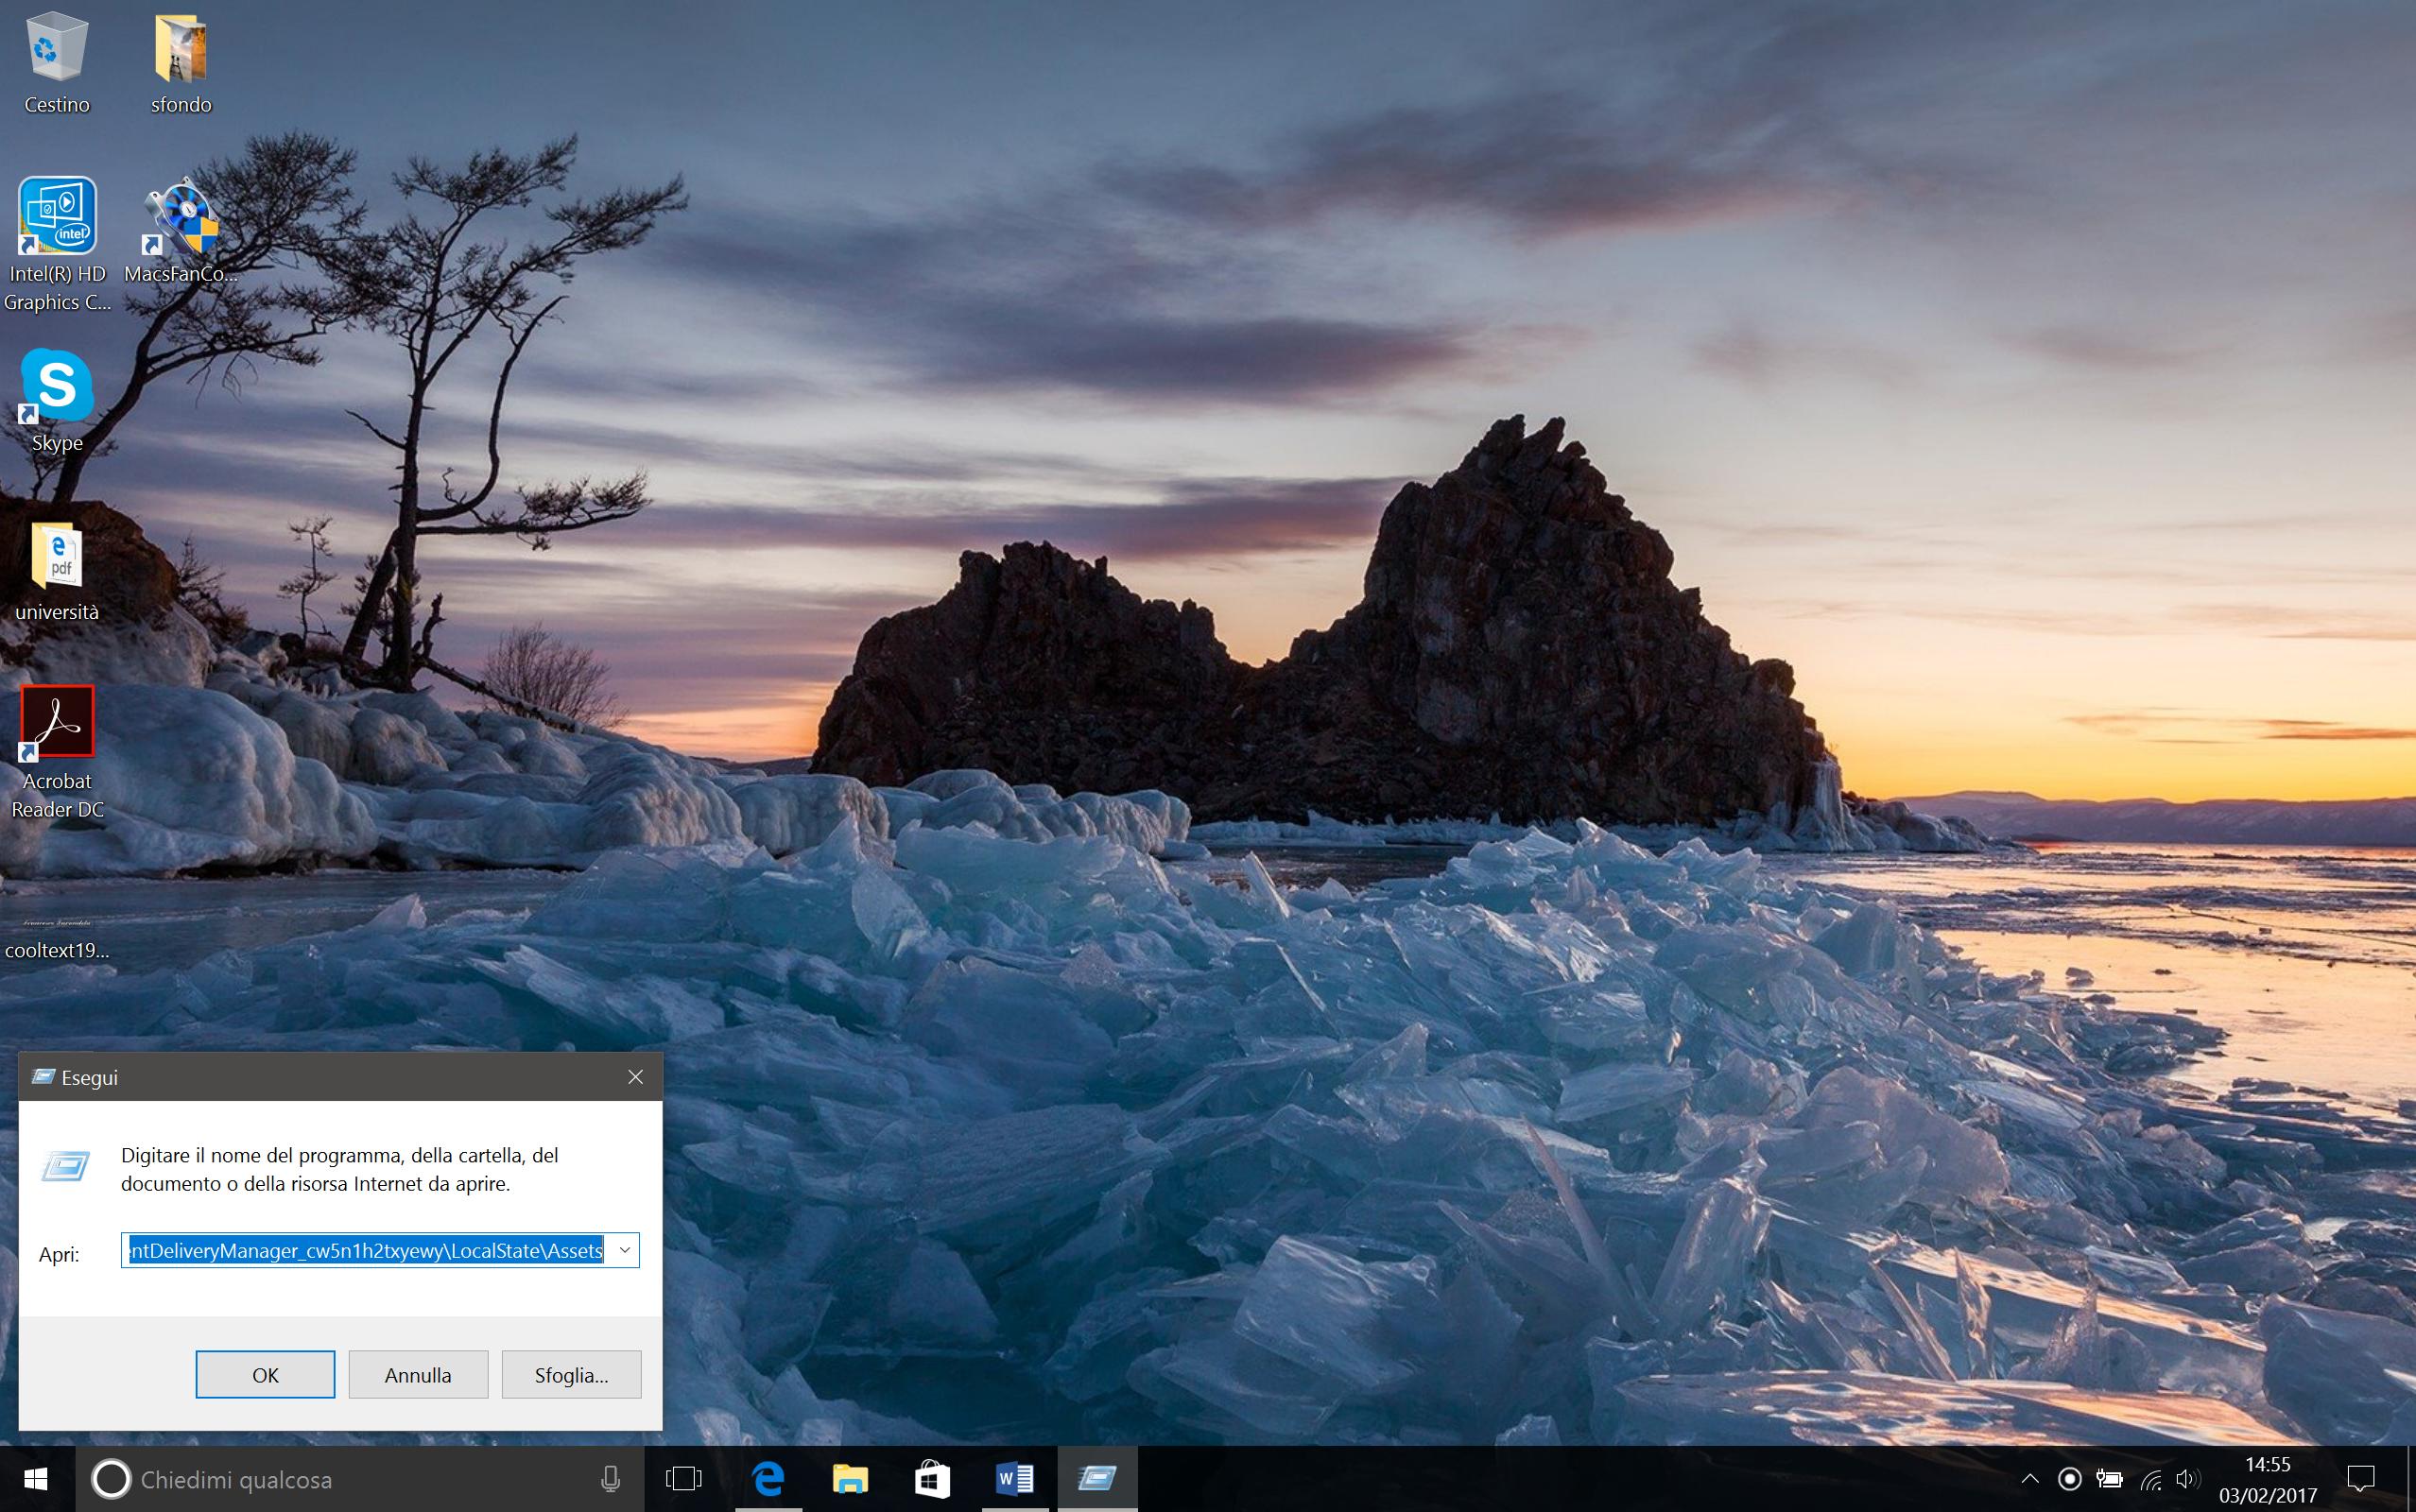 Guida Salvare Le Immagini Di Blocco In Windows 10 Francesco Incandela